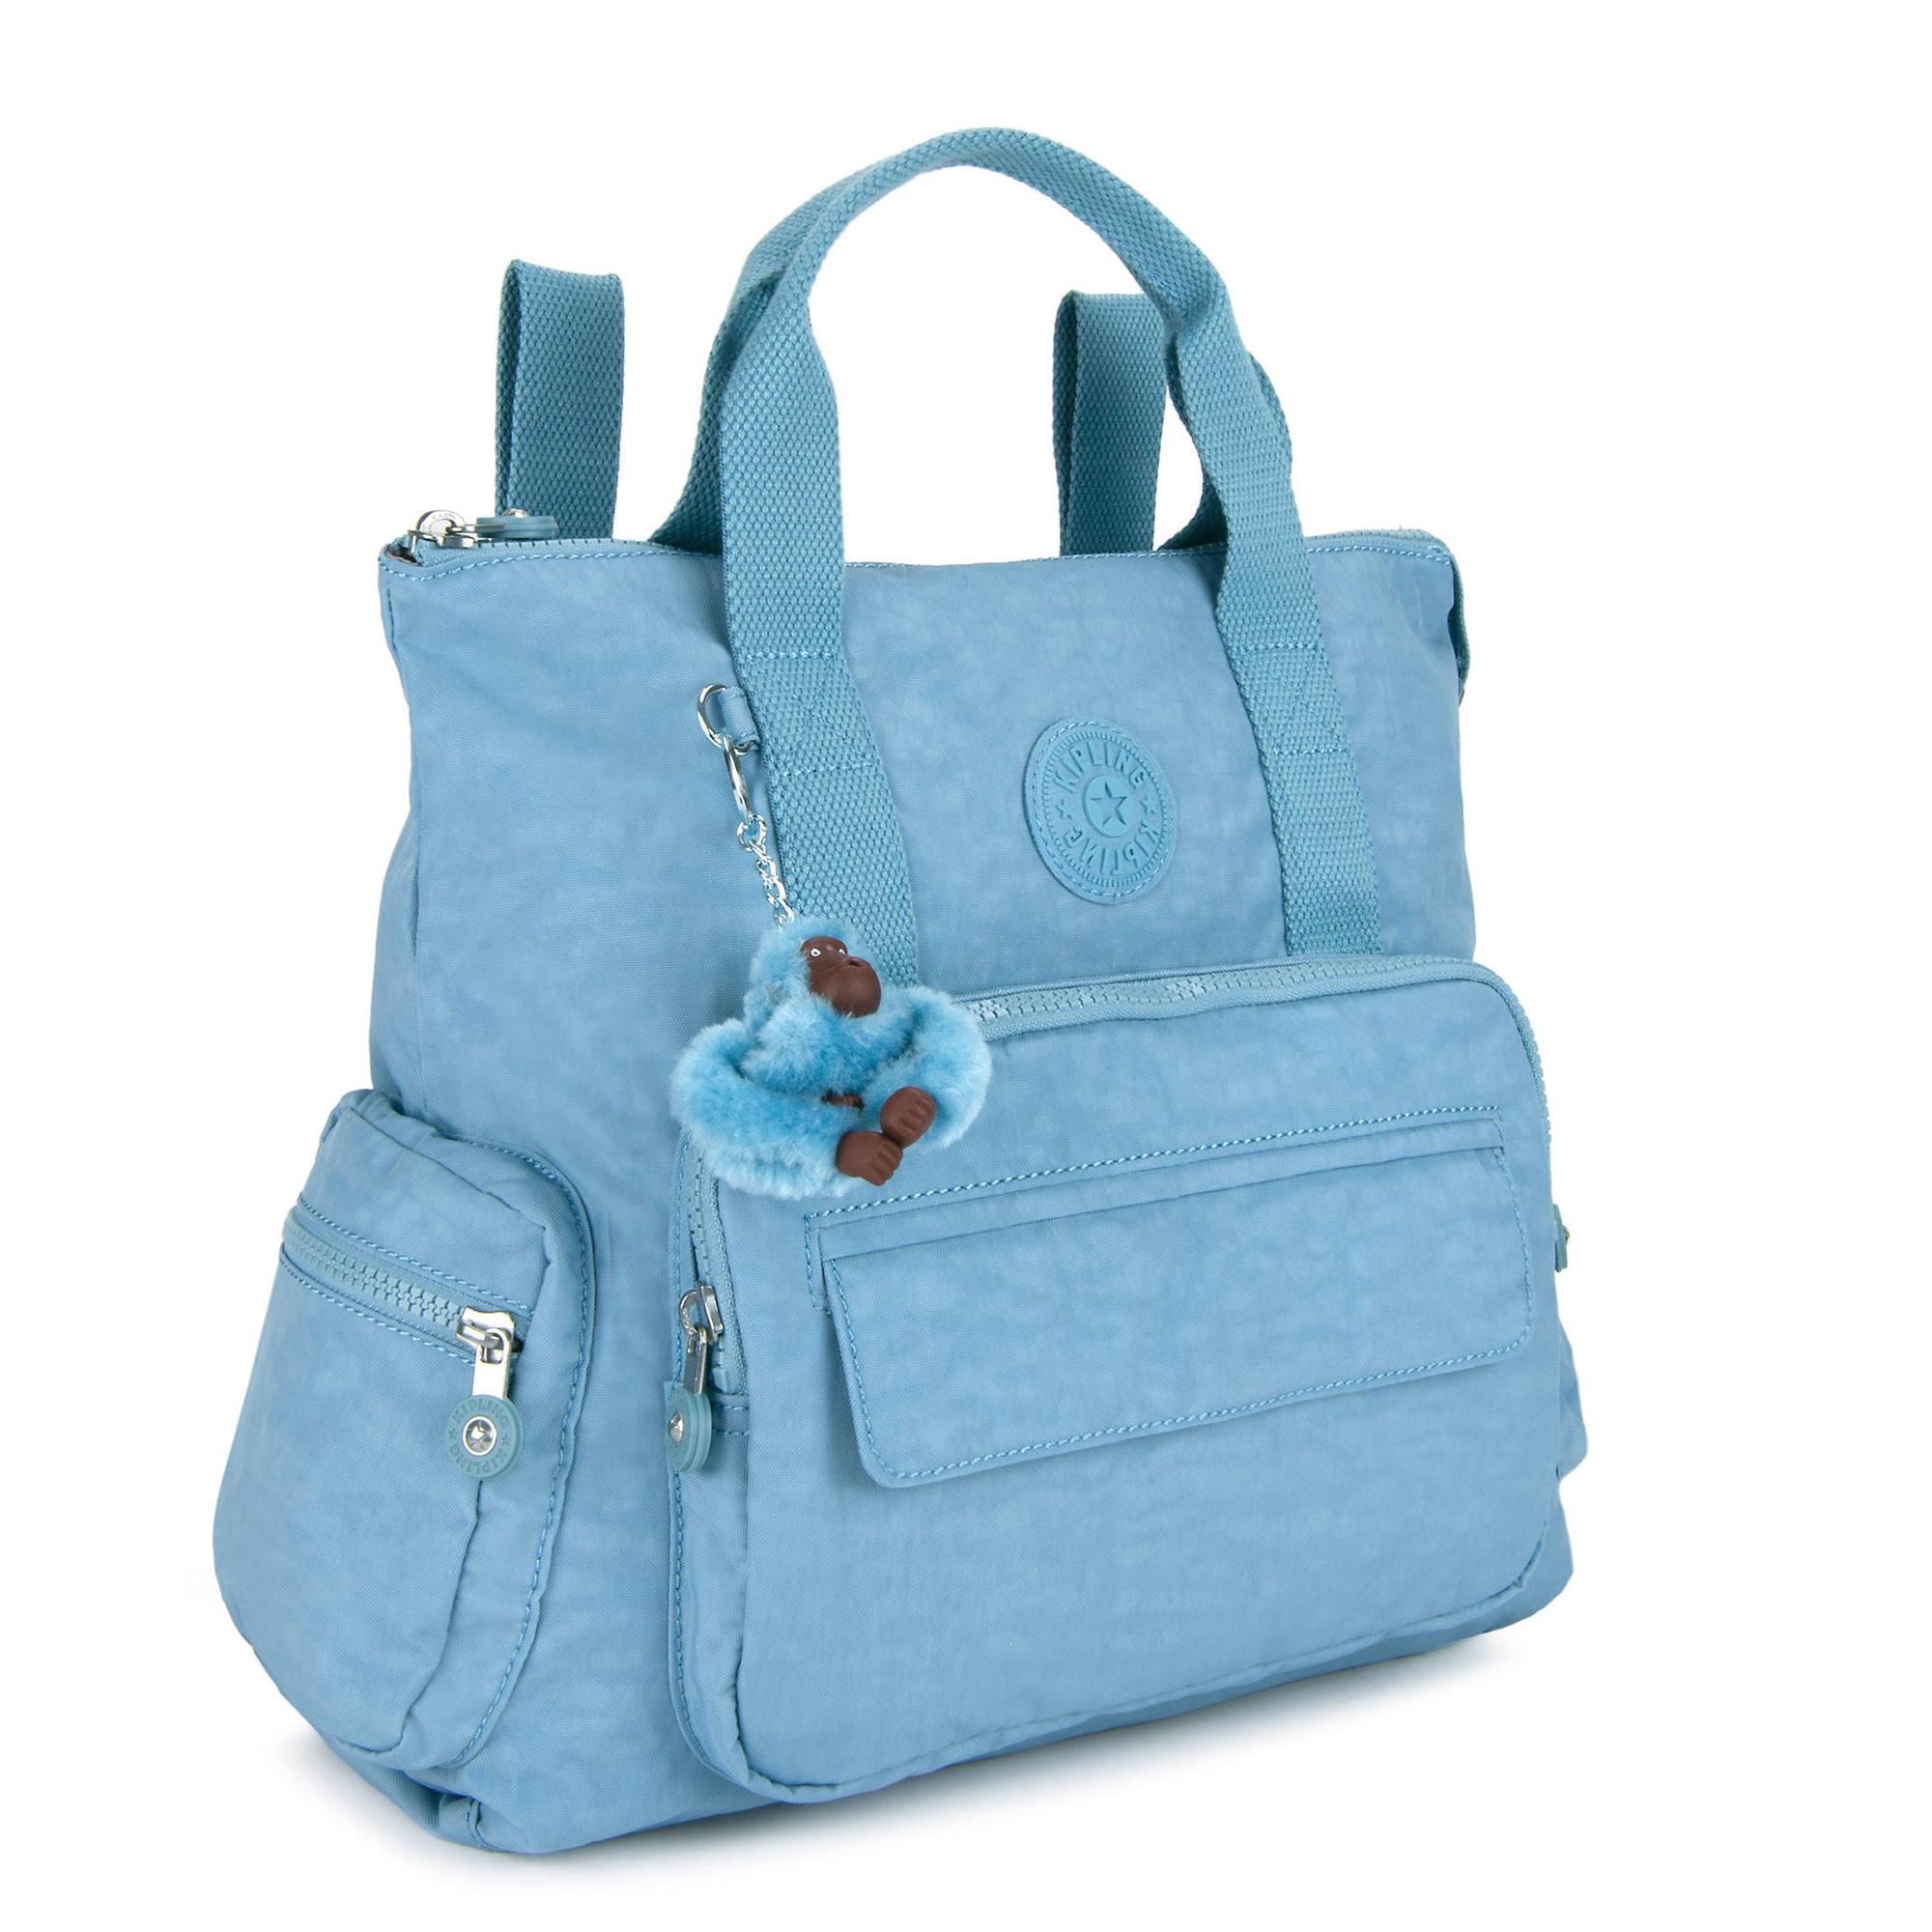 Kipling-Alvy-2-In-1-Convertible-Tote-Bag-Backpack miniatura 11